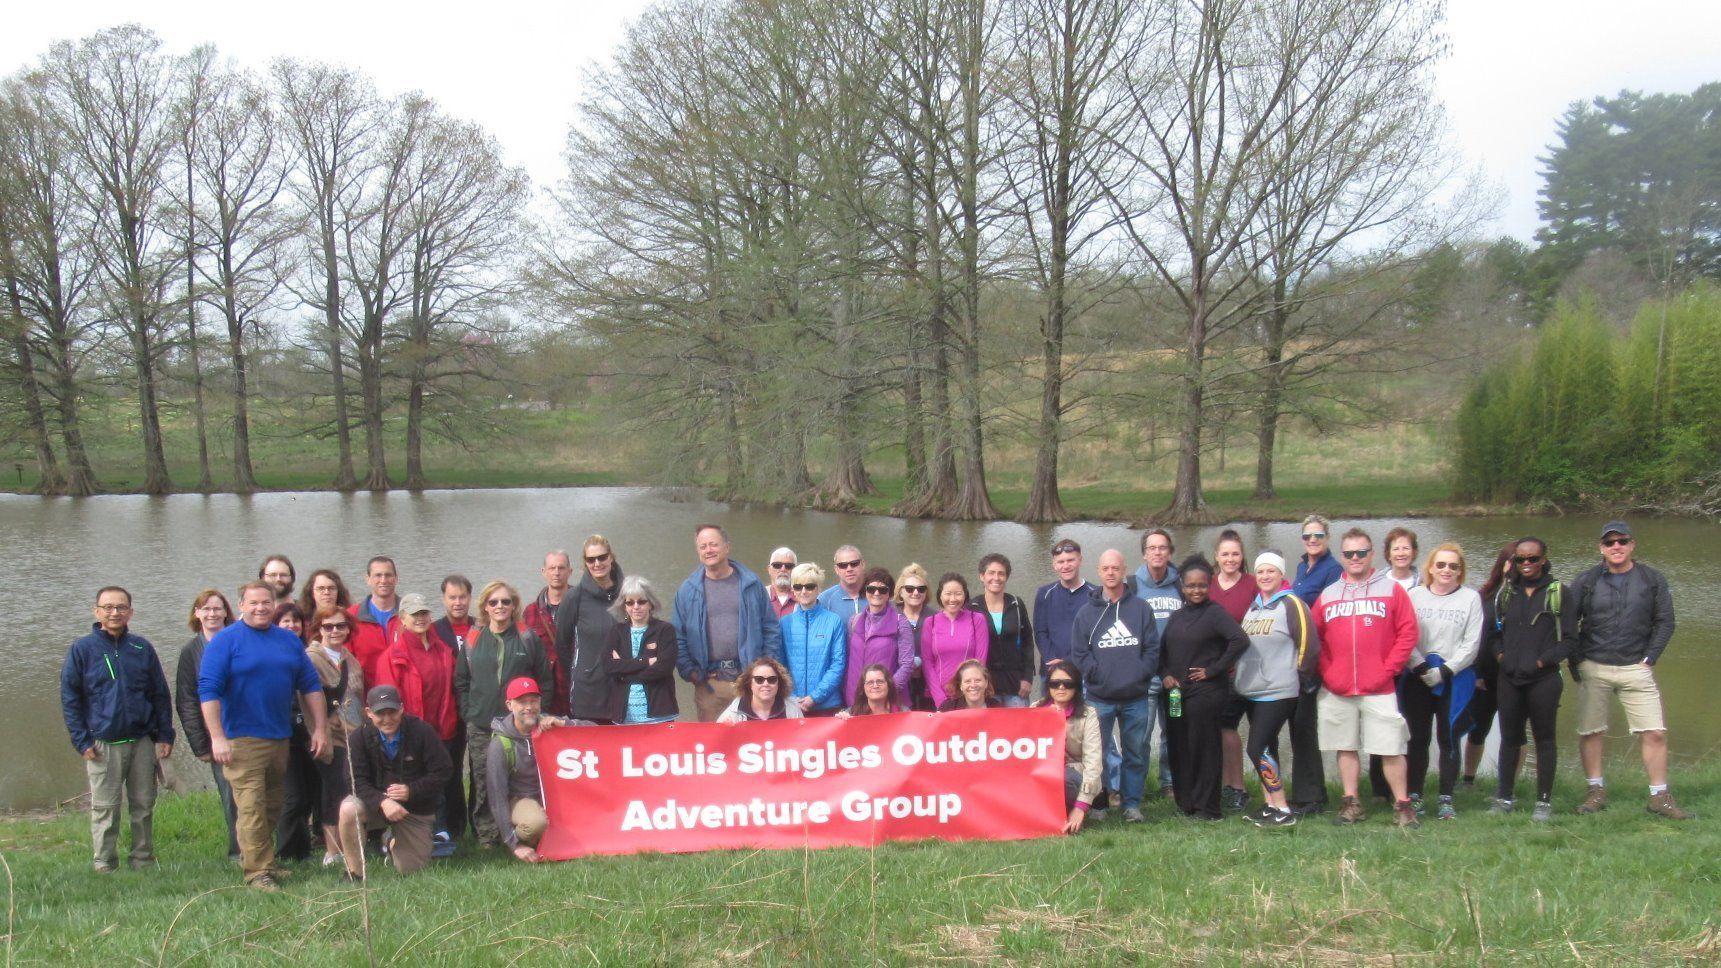 Saint Louis Singles Outdoor Adventure Group